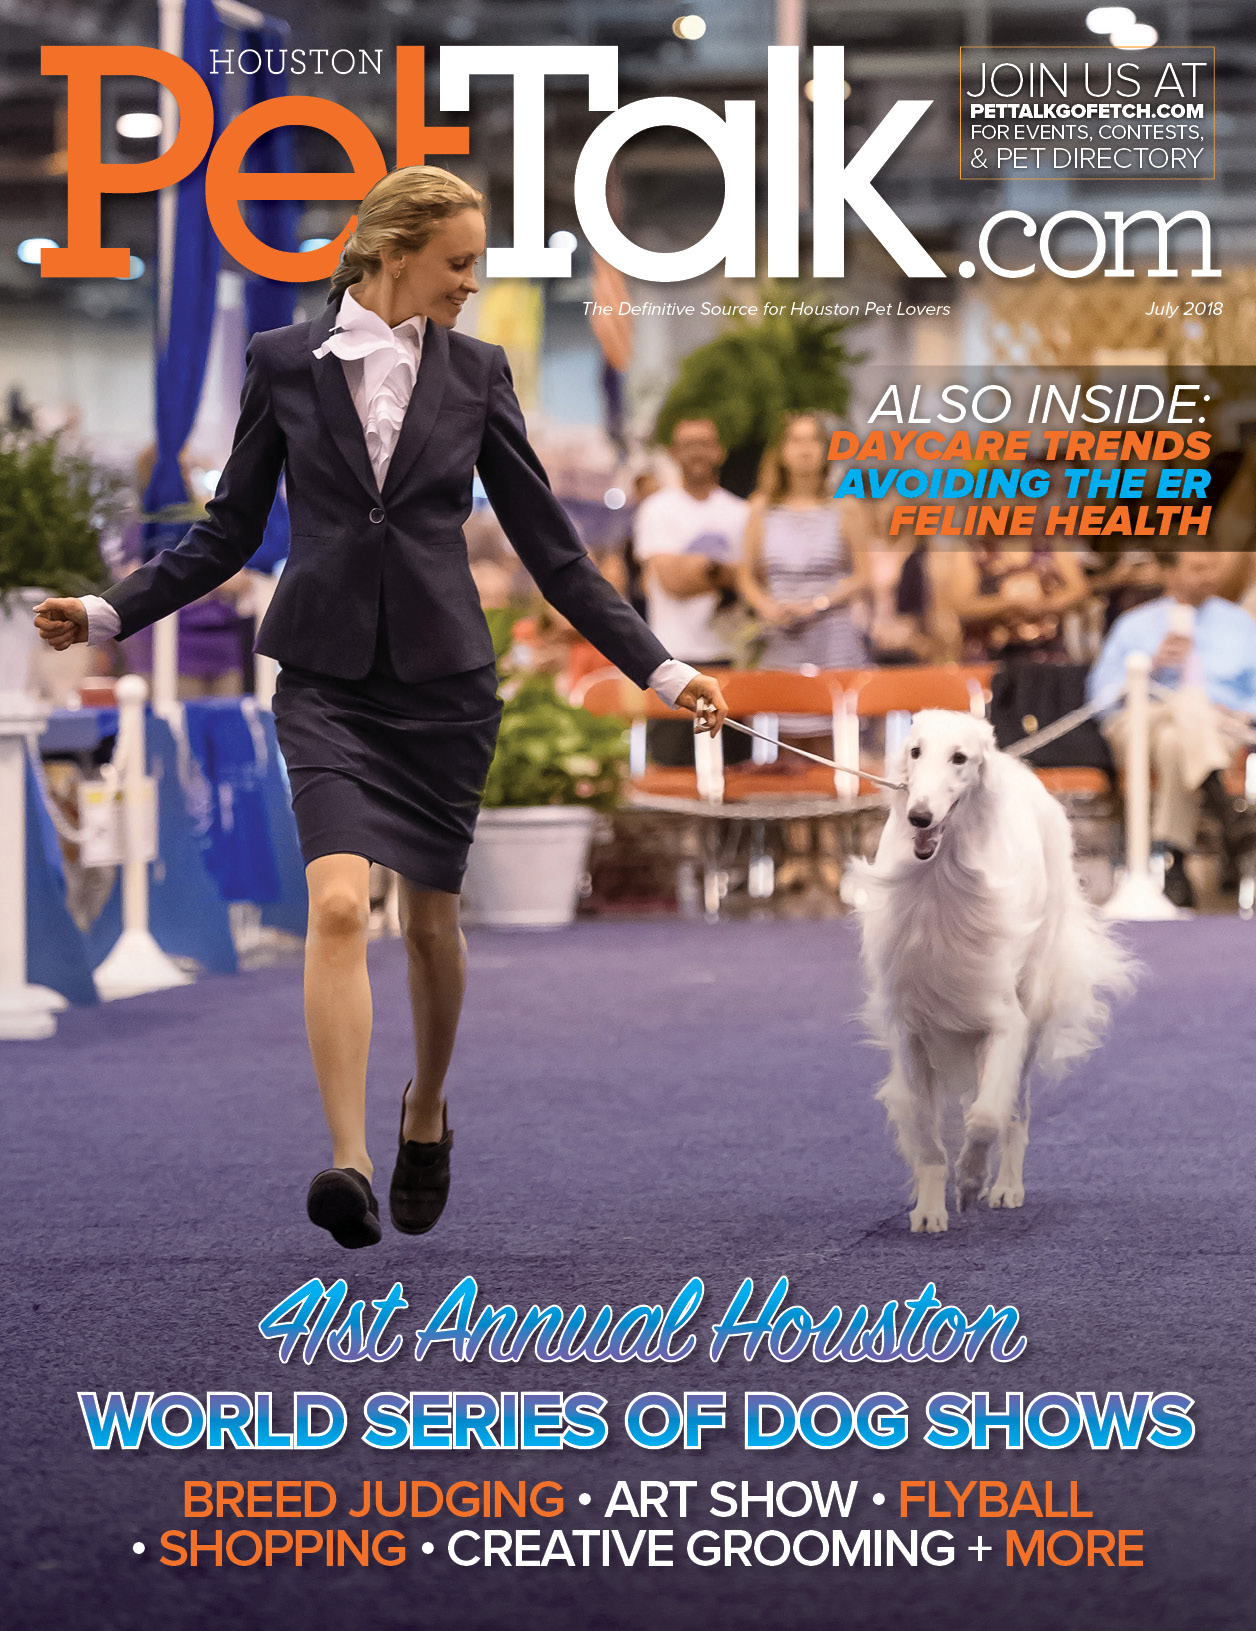 July 2018 Digital Issue of Houston PetTalk